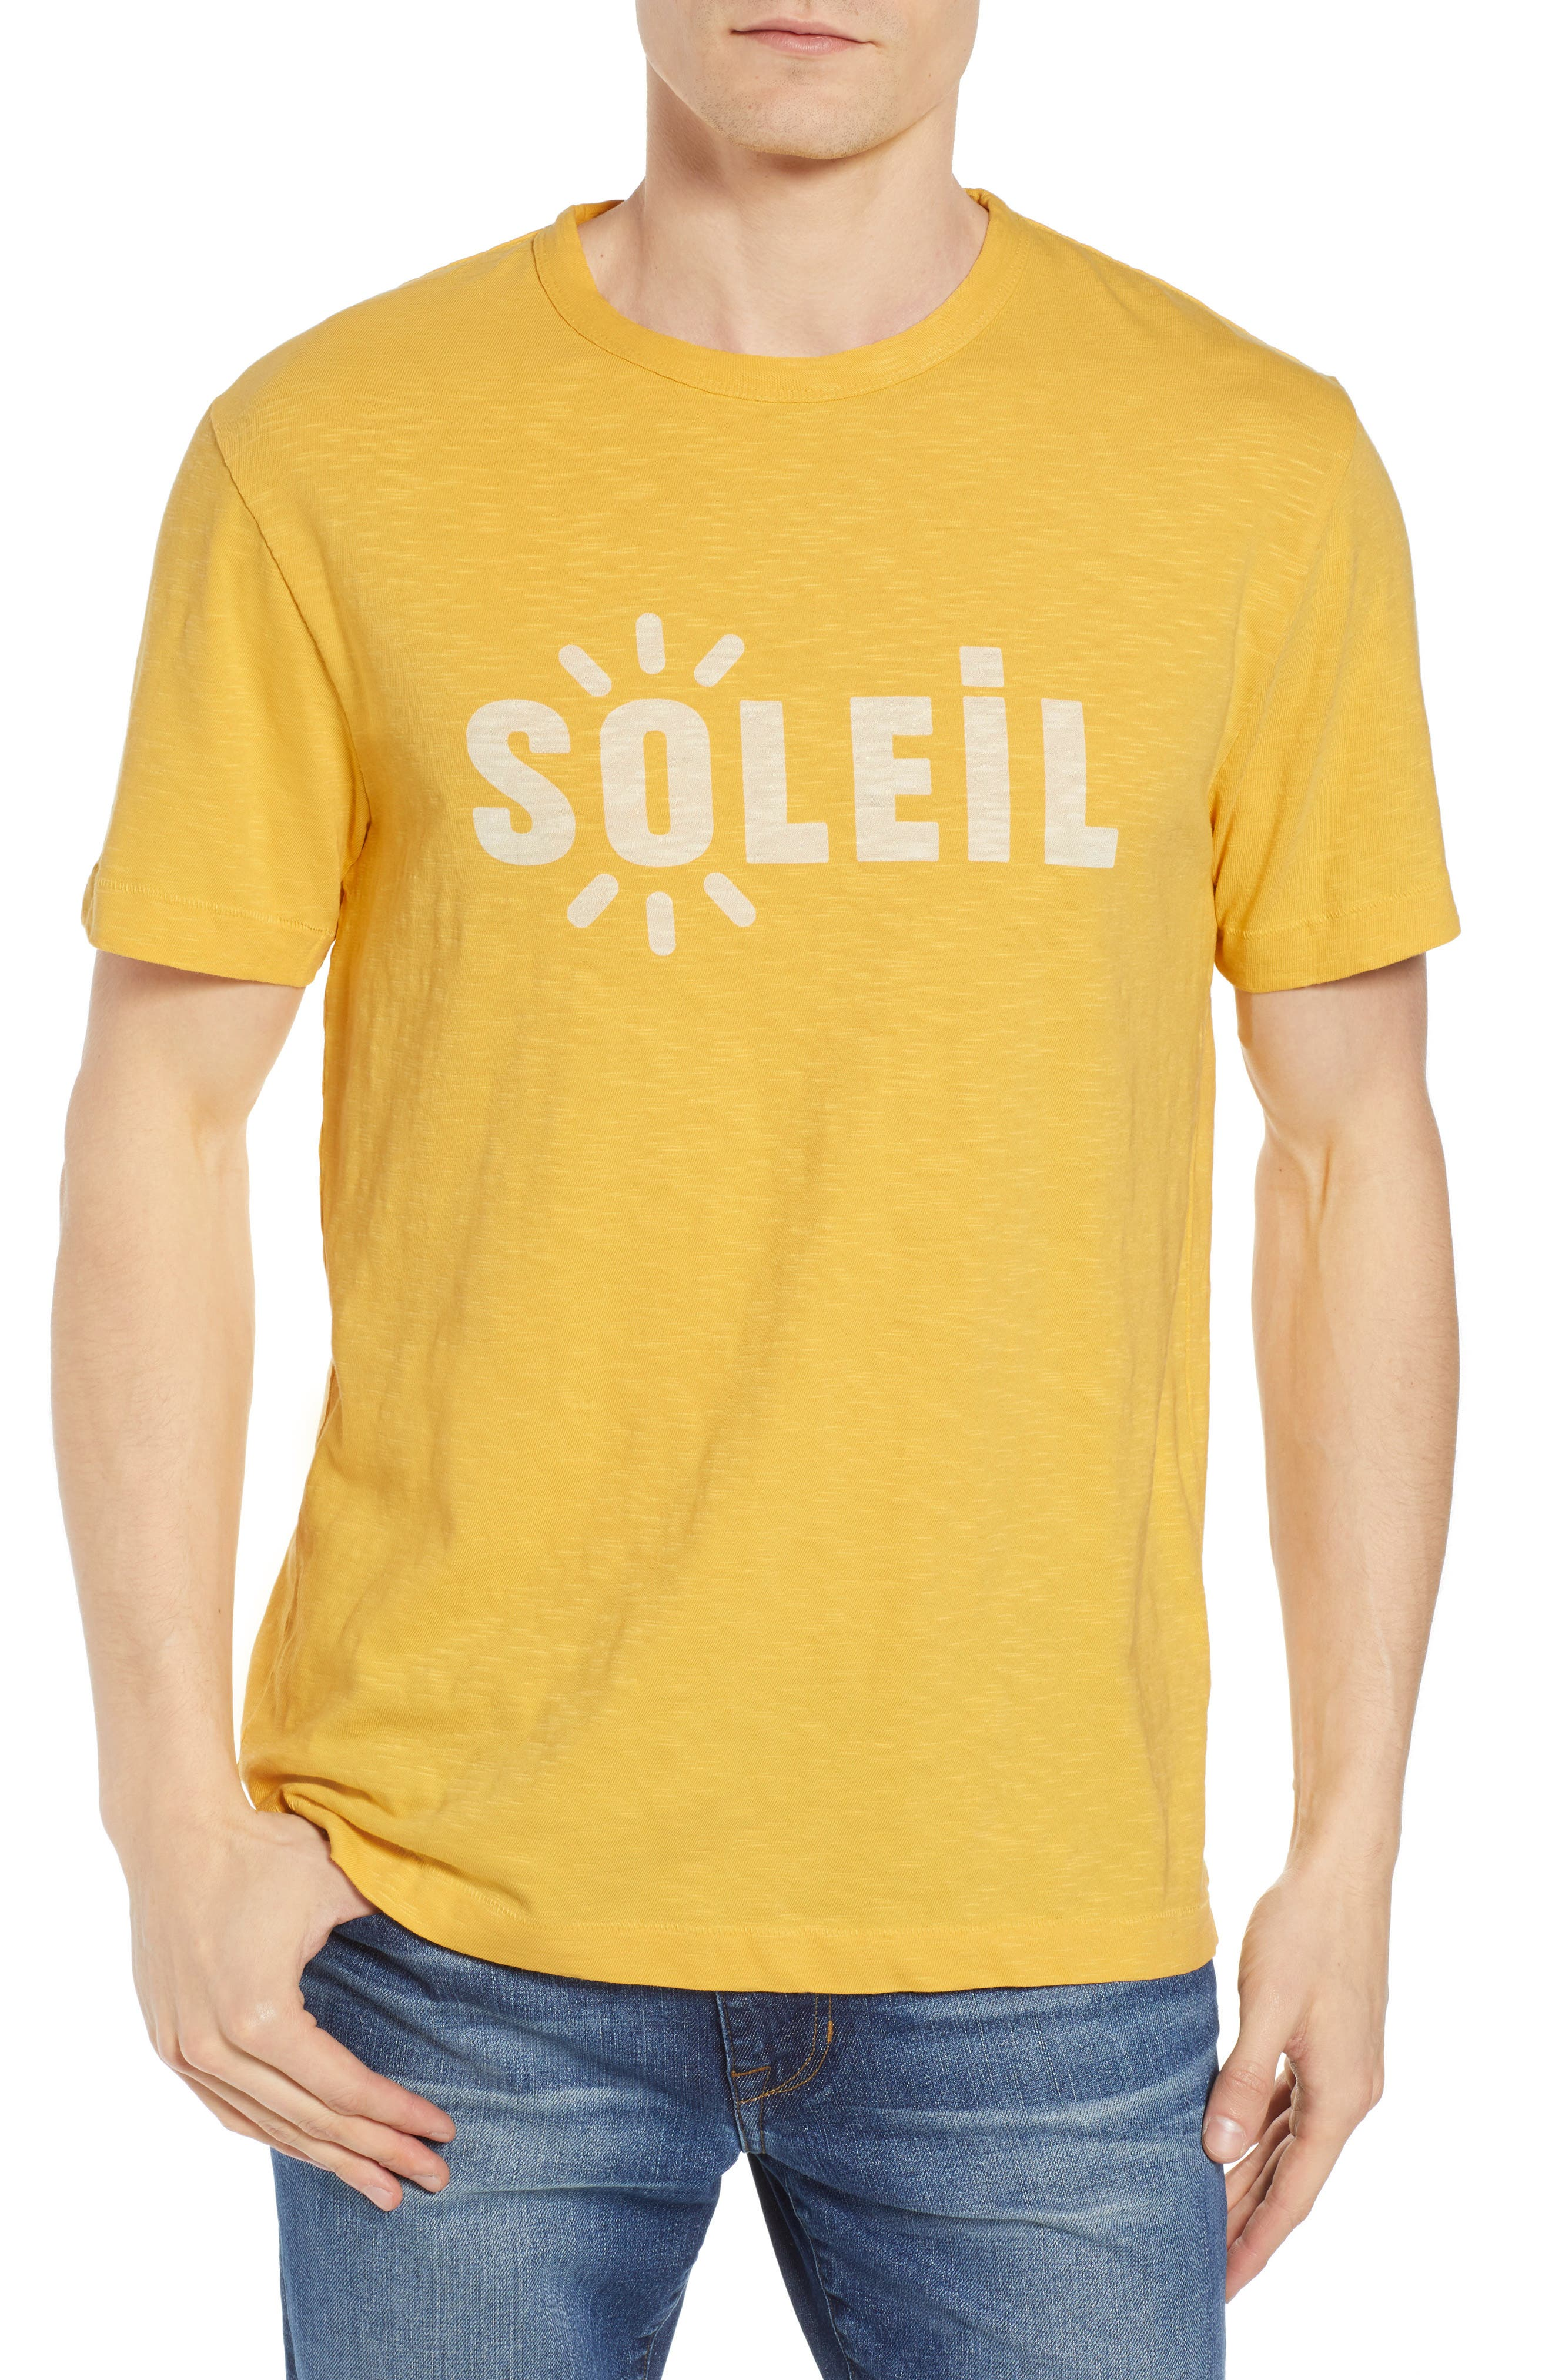 Soleil T-Shirt,                             Main thumbnail 1, color,                             731